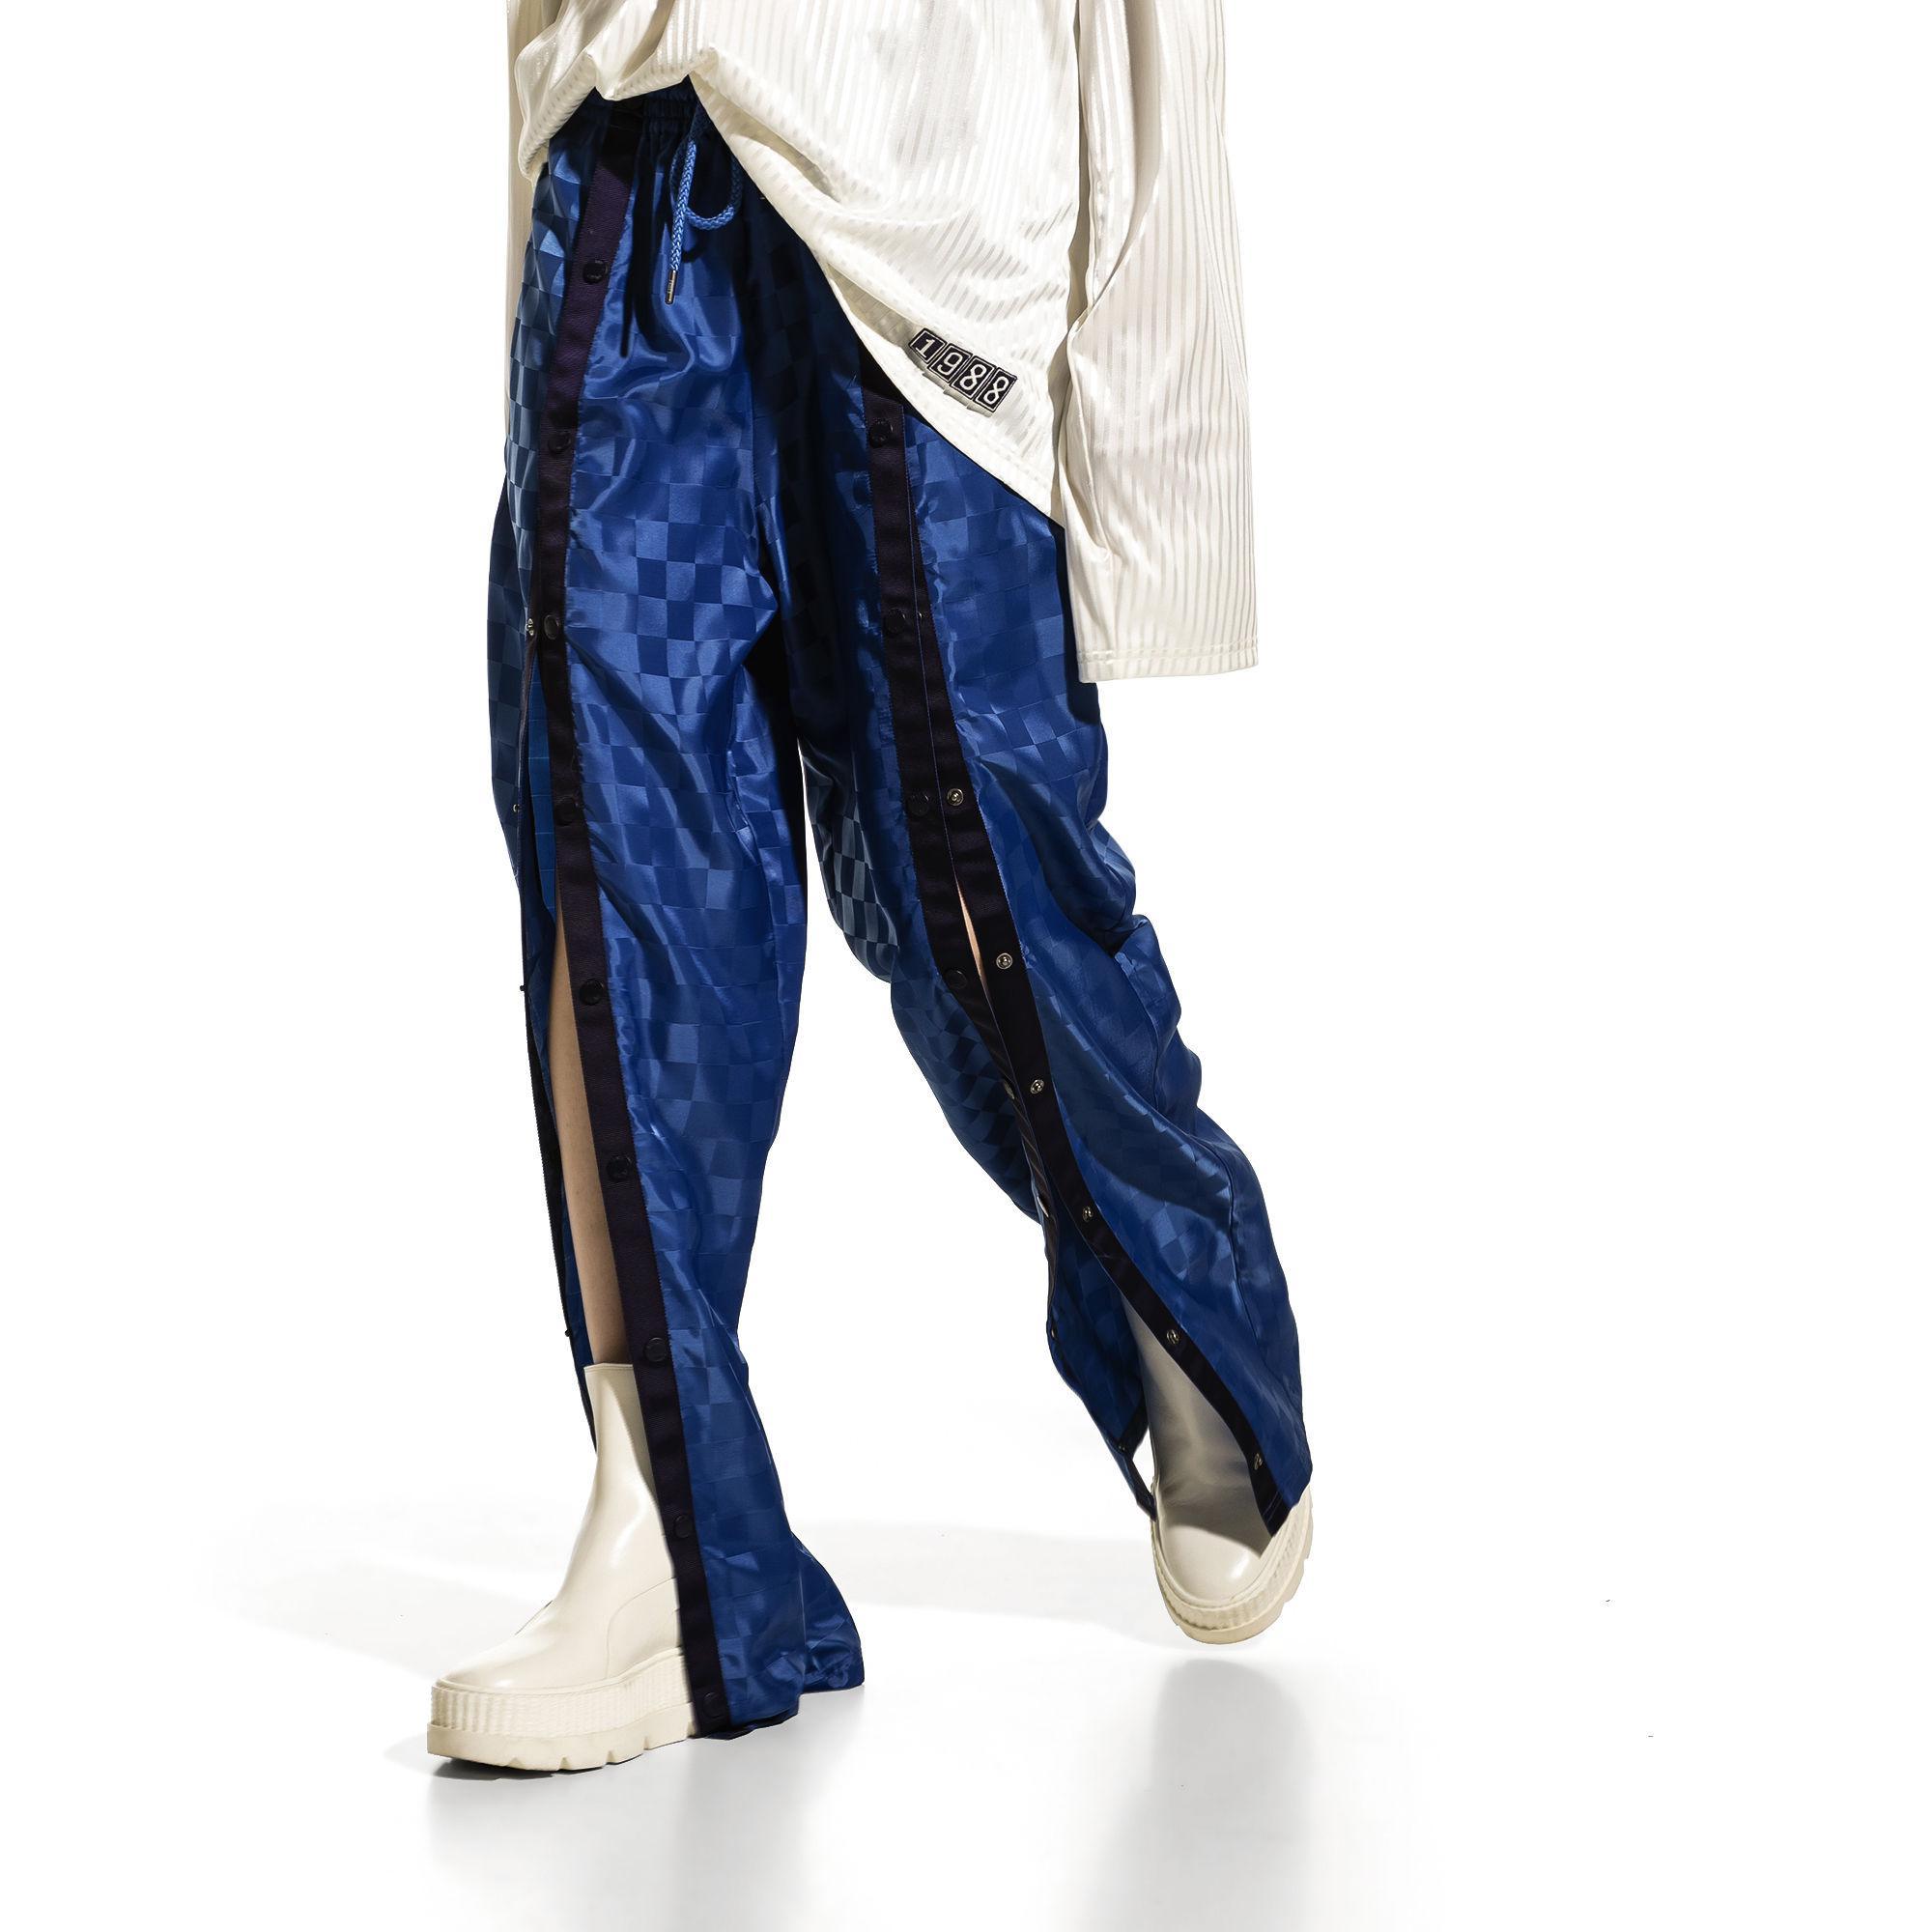 687f32dac62 PUMA Fenty Women's Front Tearaway Track Pant in Blue - Lyst